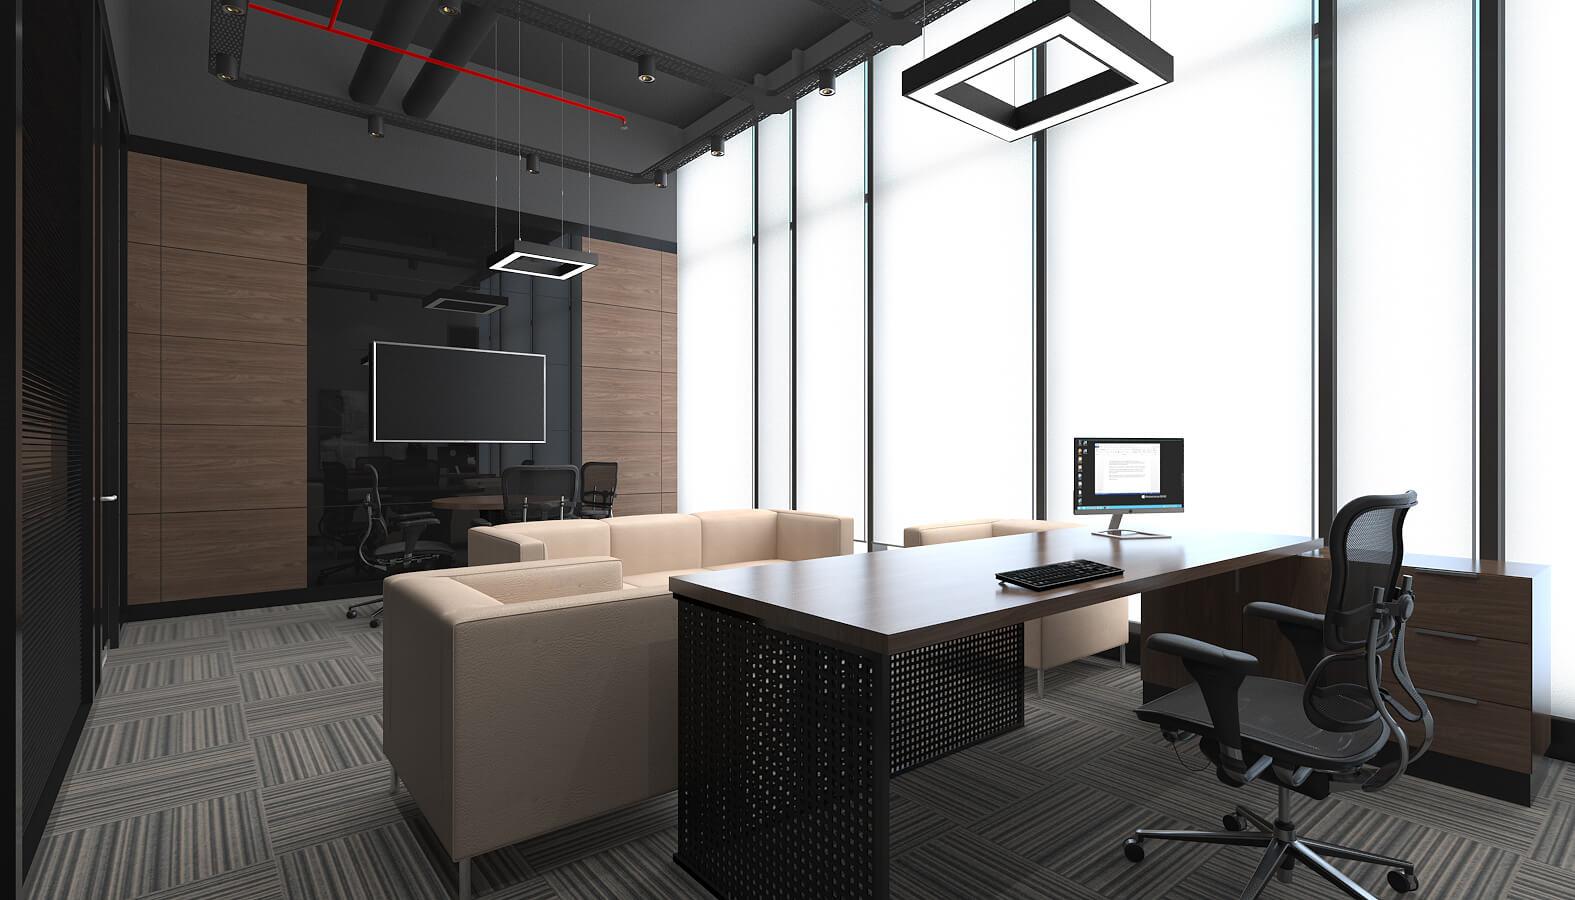 ofis içmimari 3507 Ascan Maden Çimento Ofisler